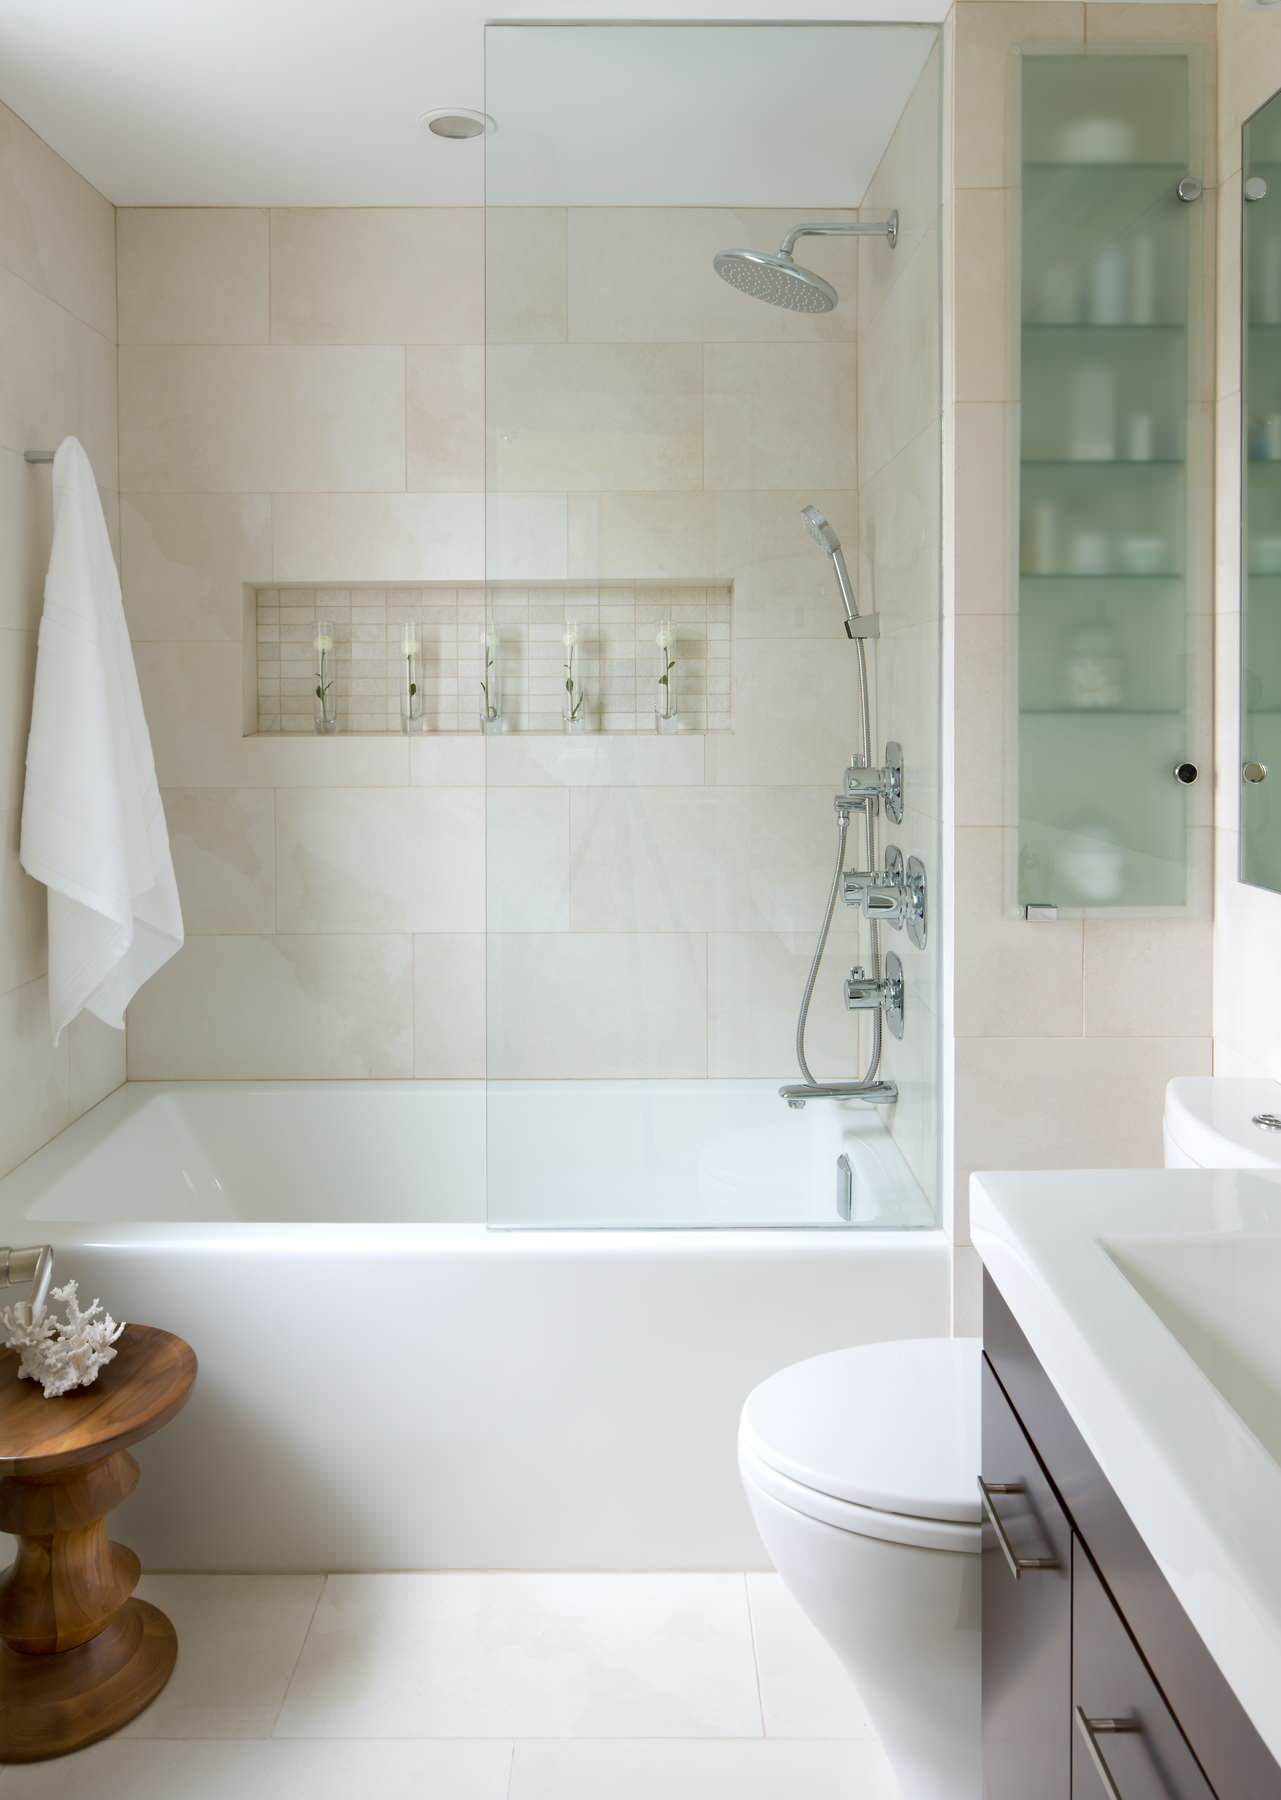 5x5 Shower Bathroom Ideas Photos Houzz